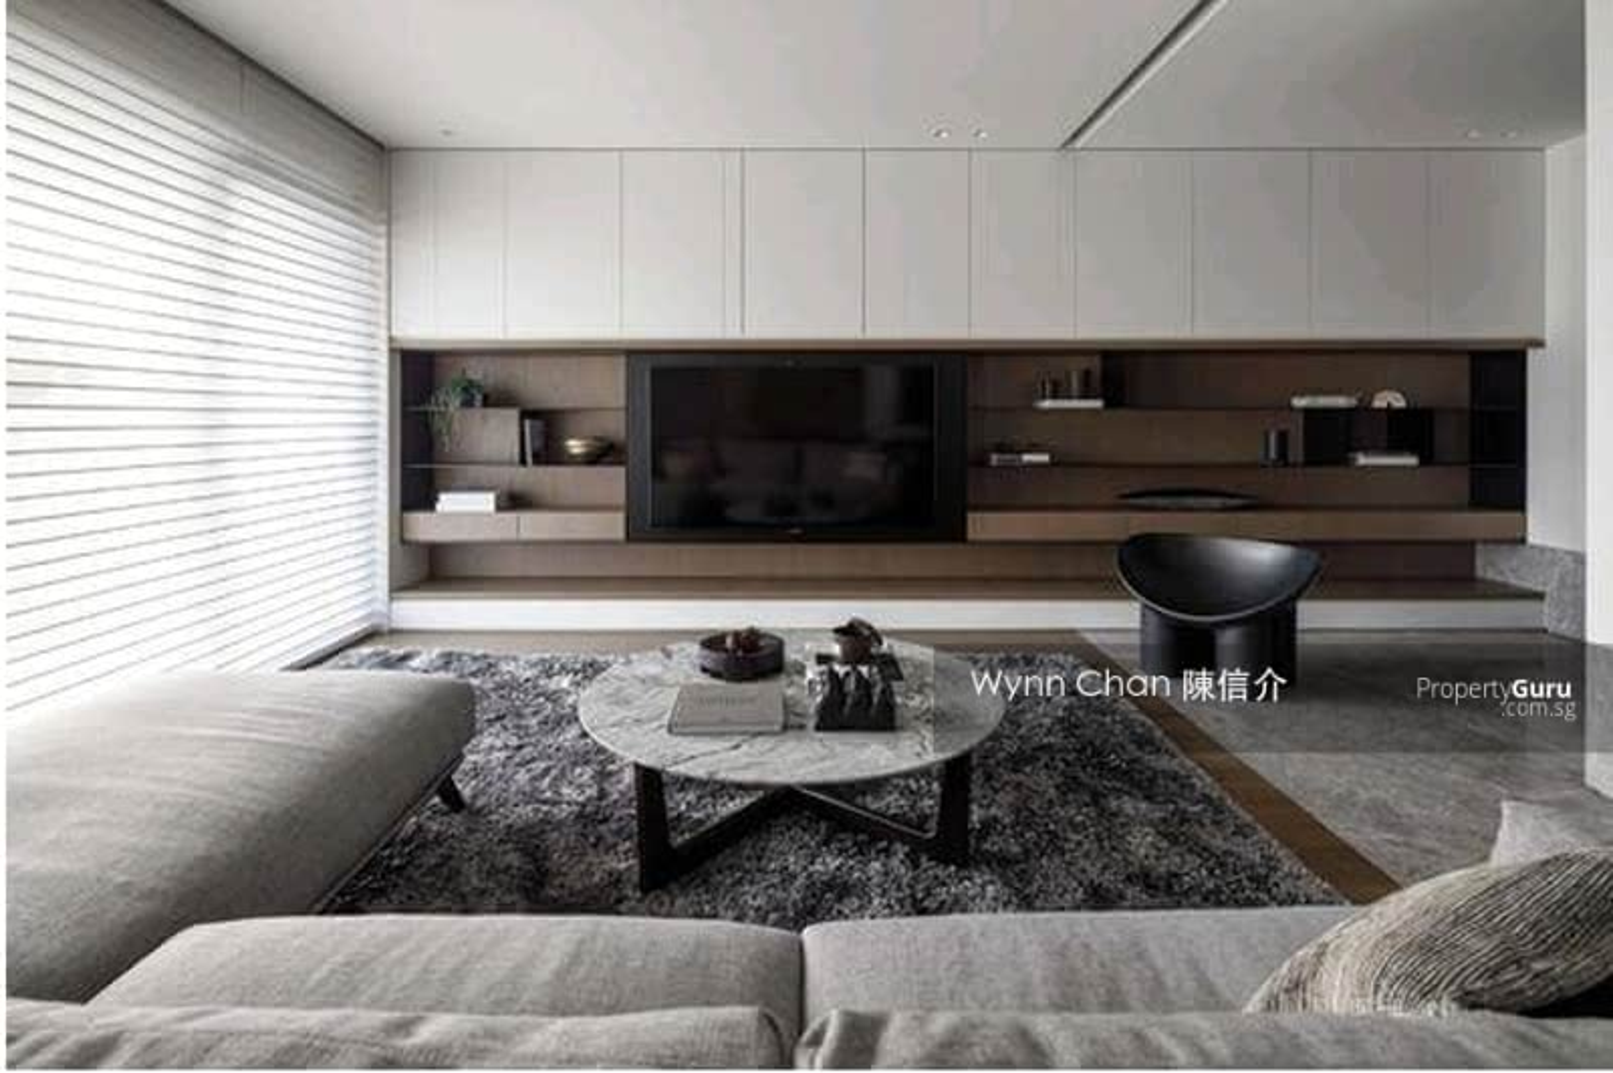 ⭐ WLD ⭐ Brand New D19 Inter Terrace Da Silva Lane #129858668